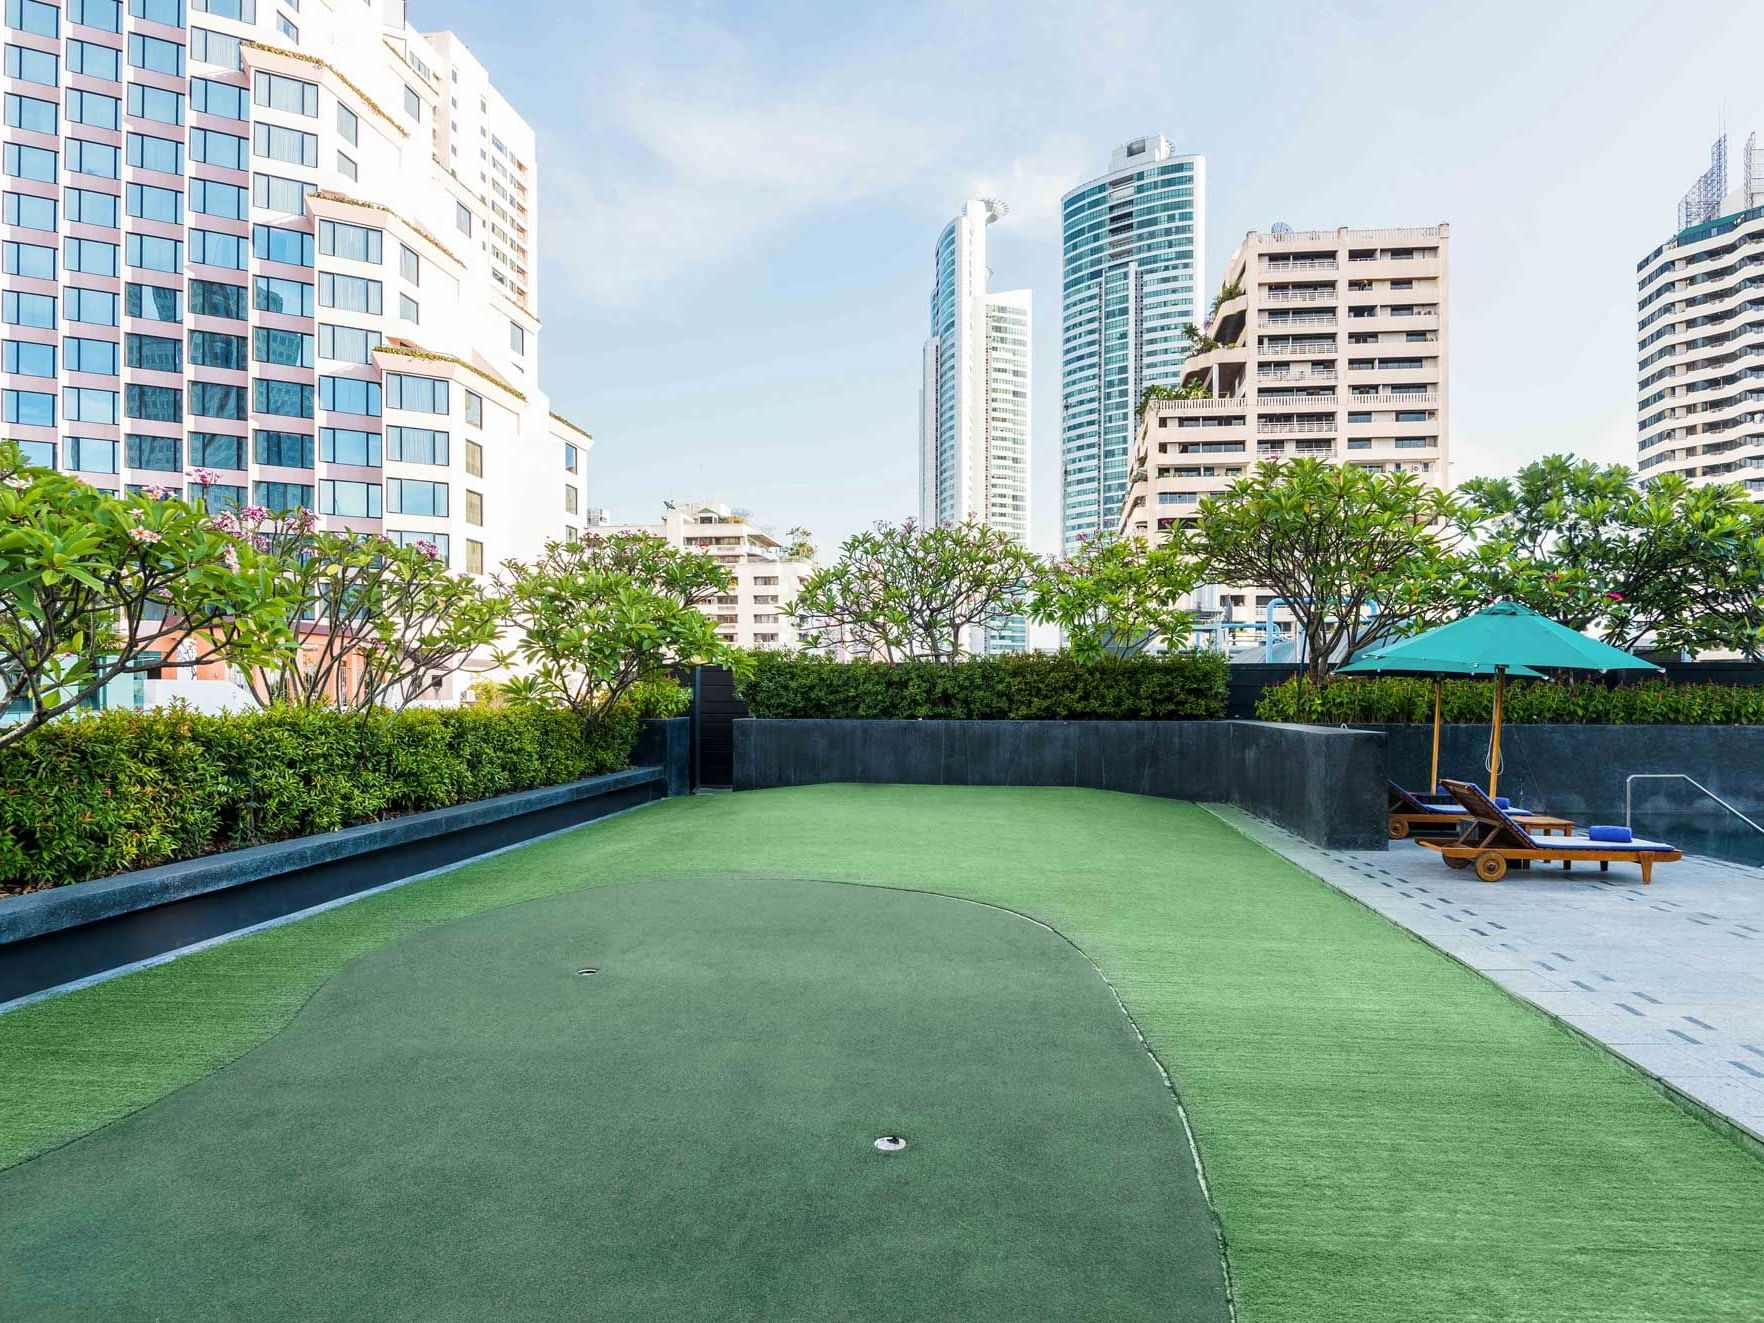 View of rooftop garden at Maitria Hotel Sukhumvit 18 Bangkok